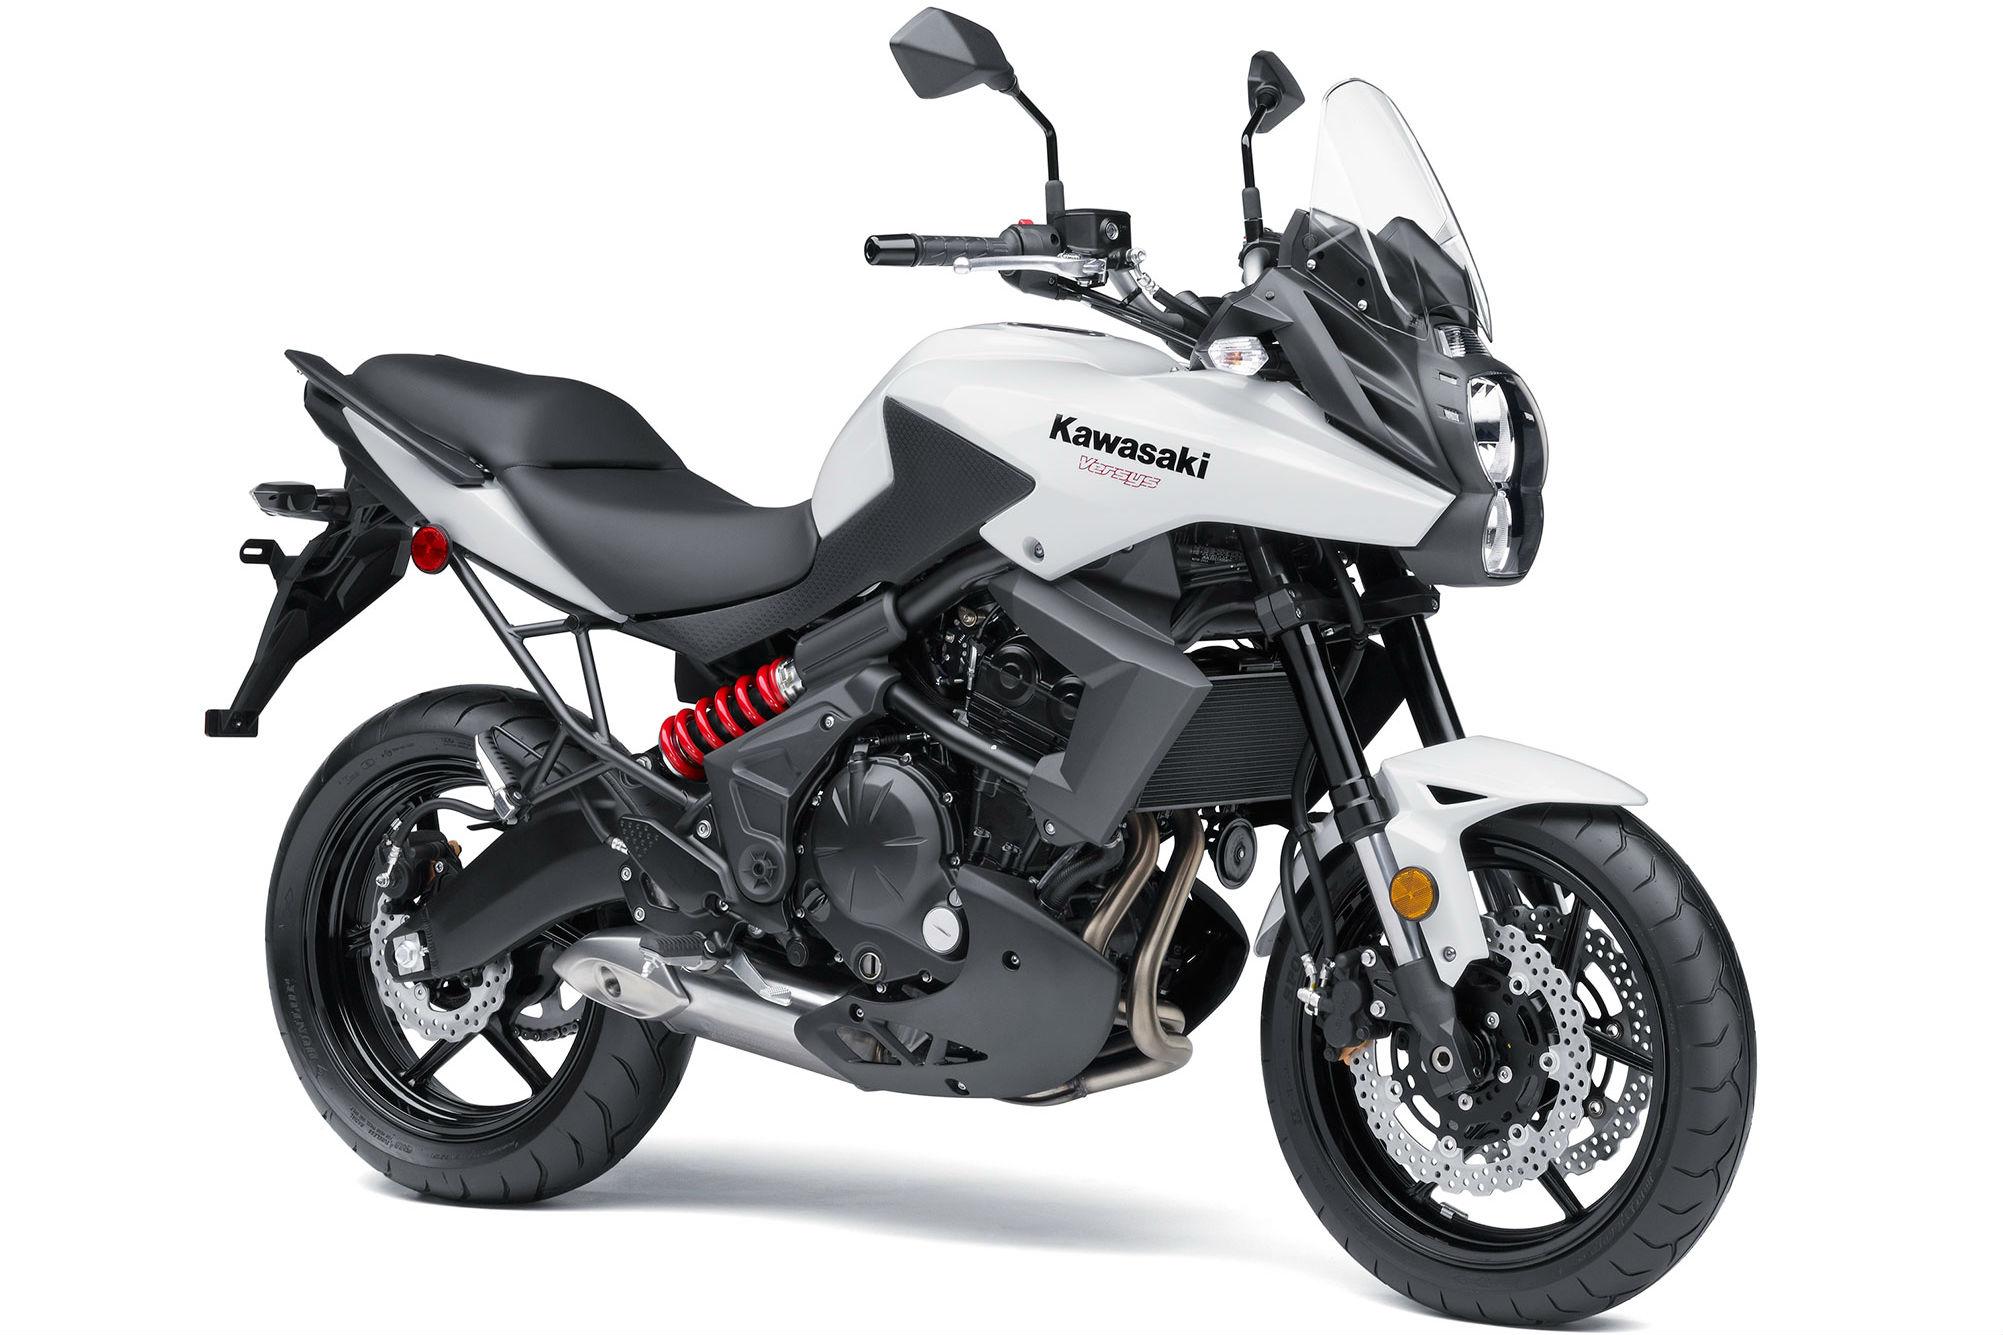 Kawasaki Versys 650 revamp planned